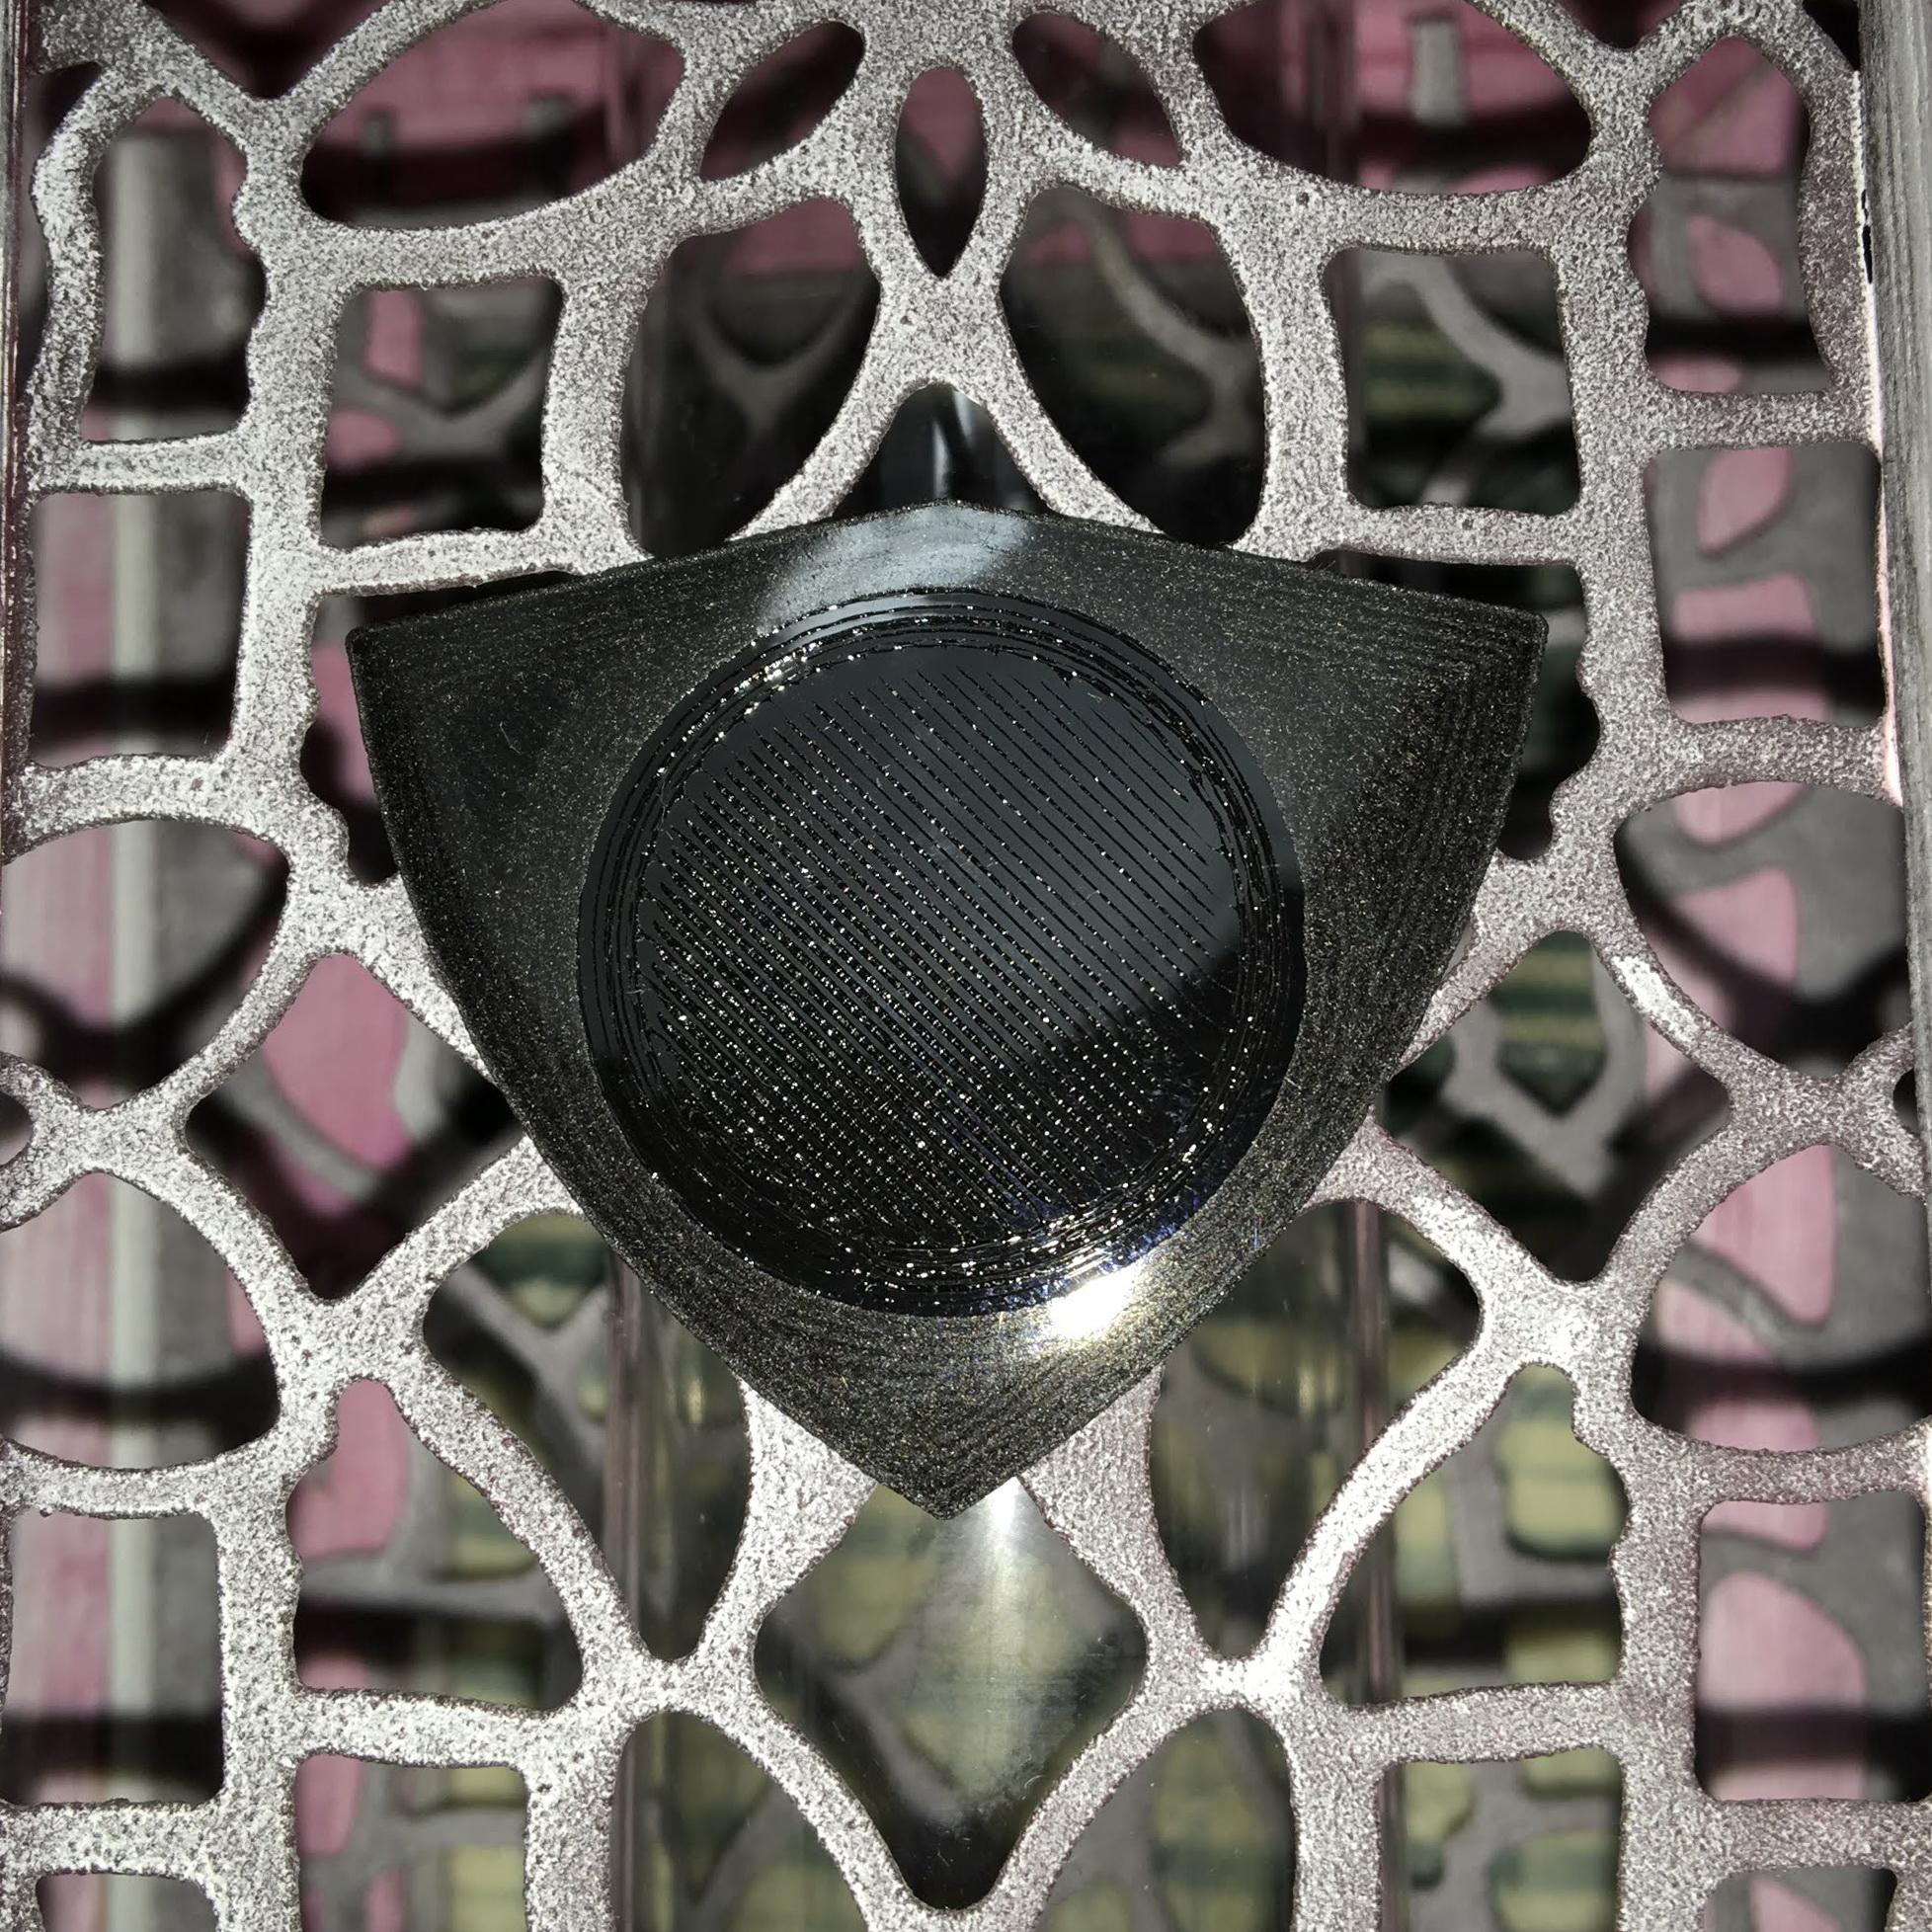 Simir 230819 fibra de carbono.JPG Download free STL file SIMIR Pua Nido Carbon Fibre and TPU Black (Nest Pick Guitar) by eXiMienTa • 3D printing design, carleslluisar